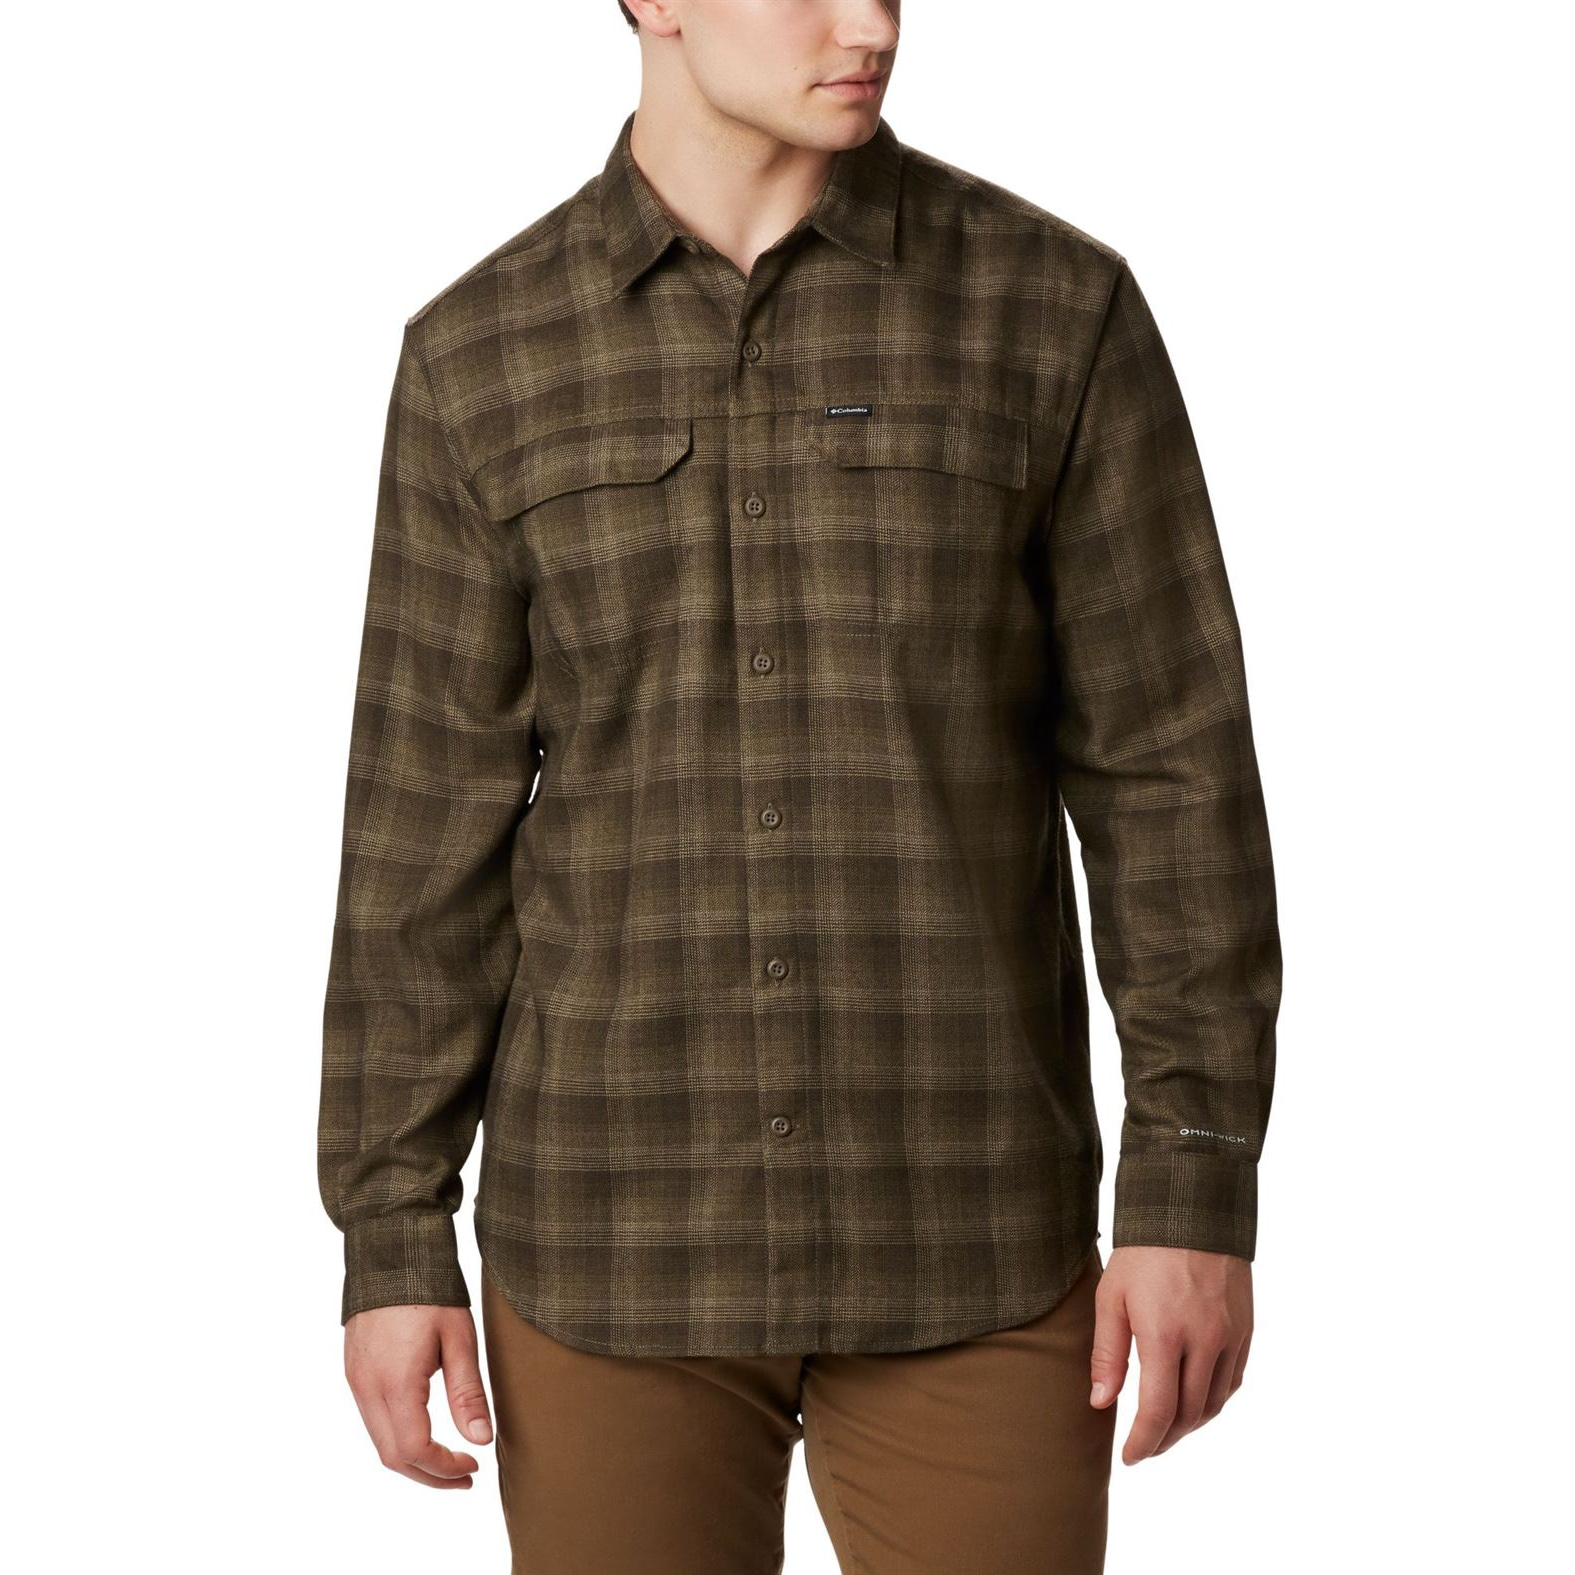 Silver Ridge 2.0 Flannel Shirt Long Sleeve Tall - Men's